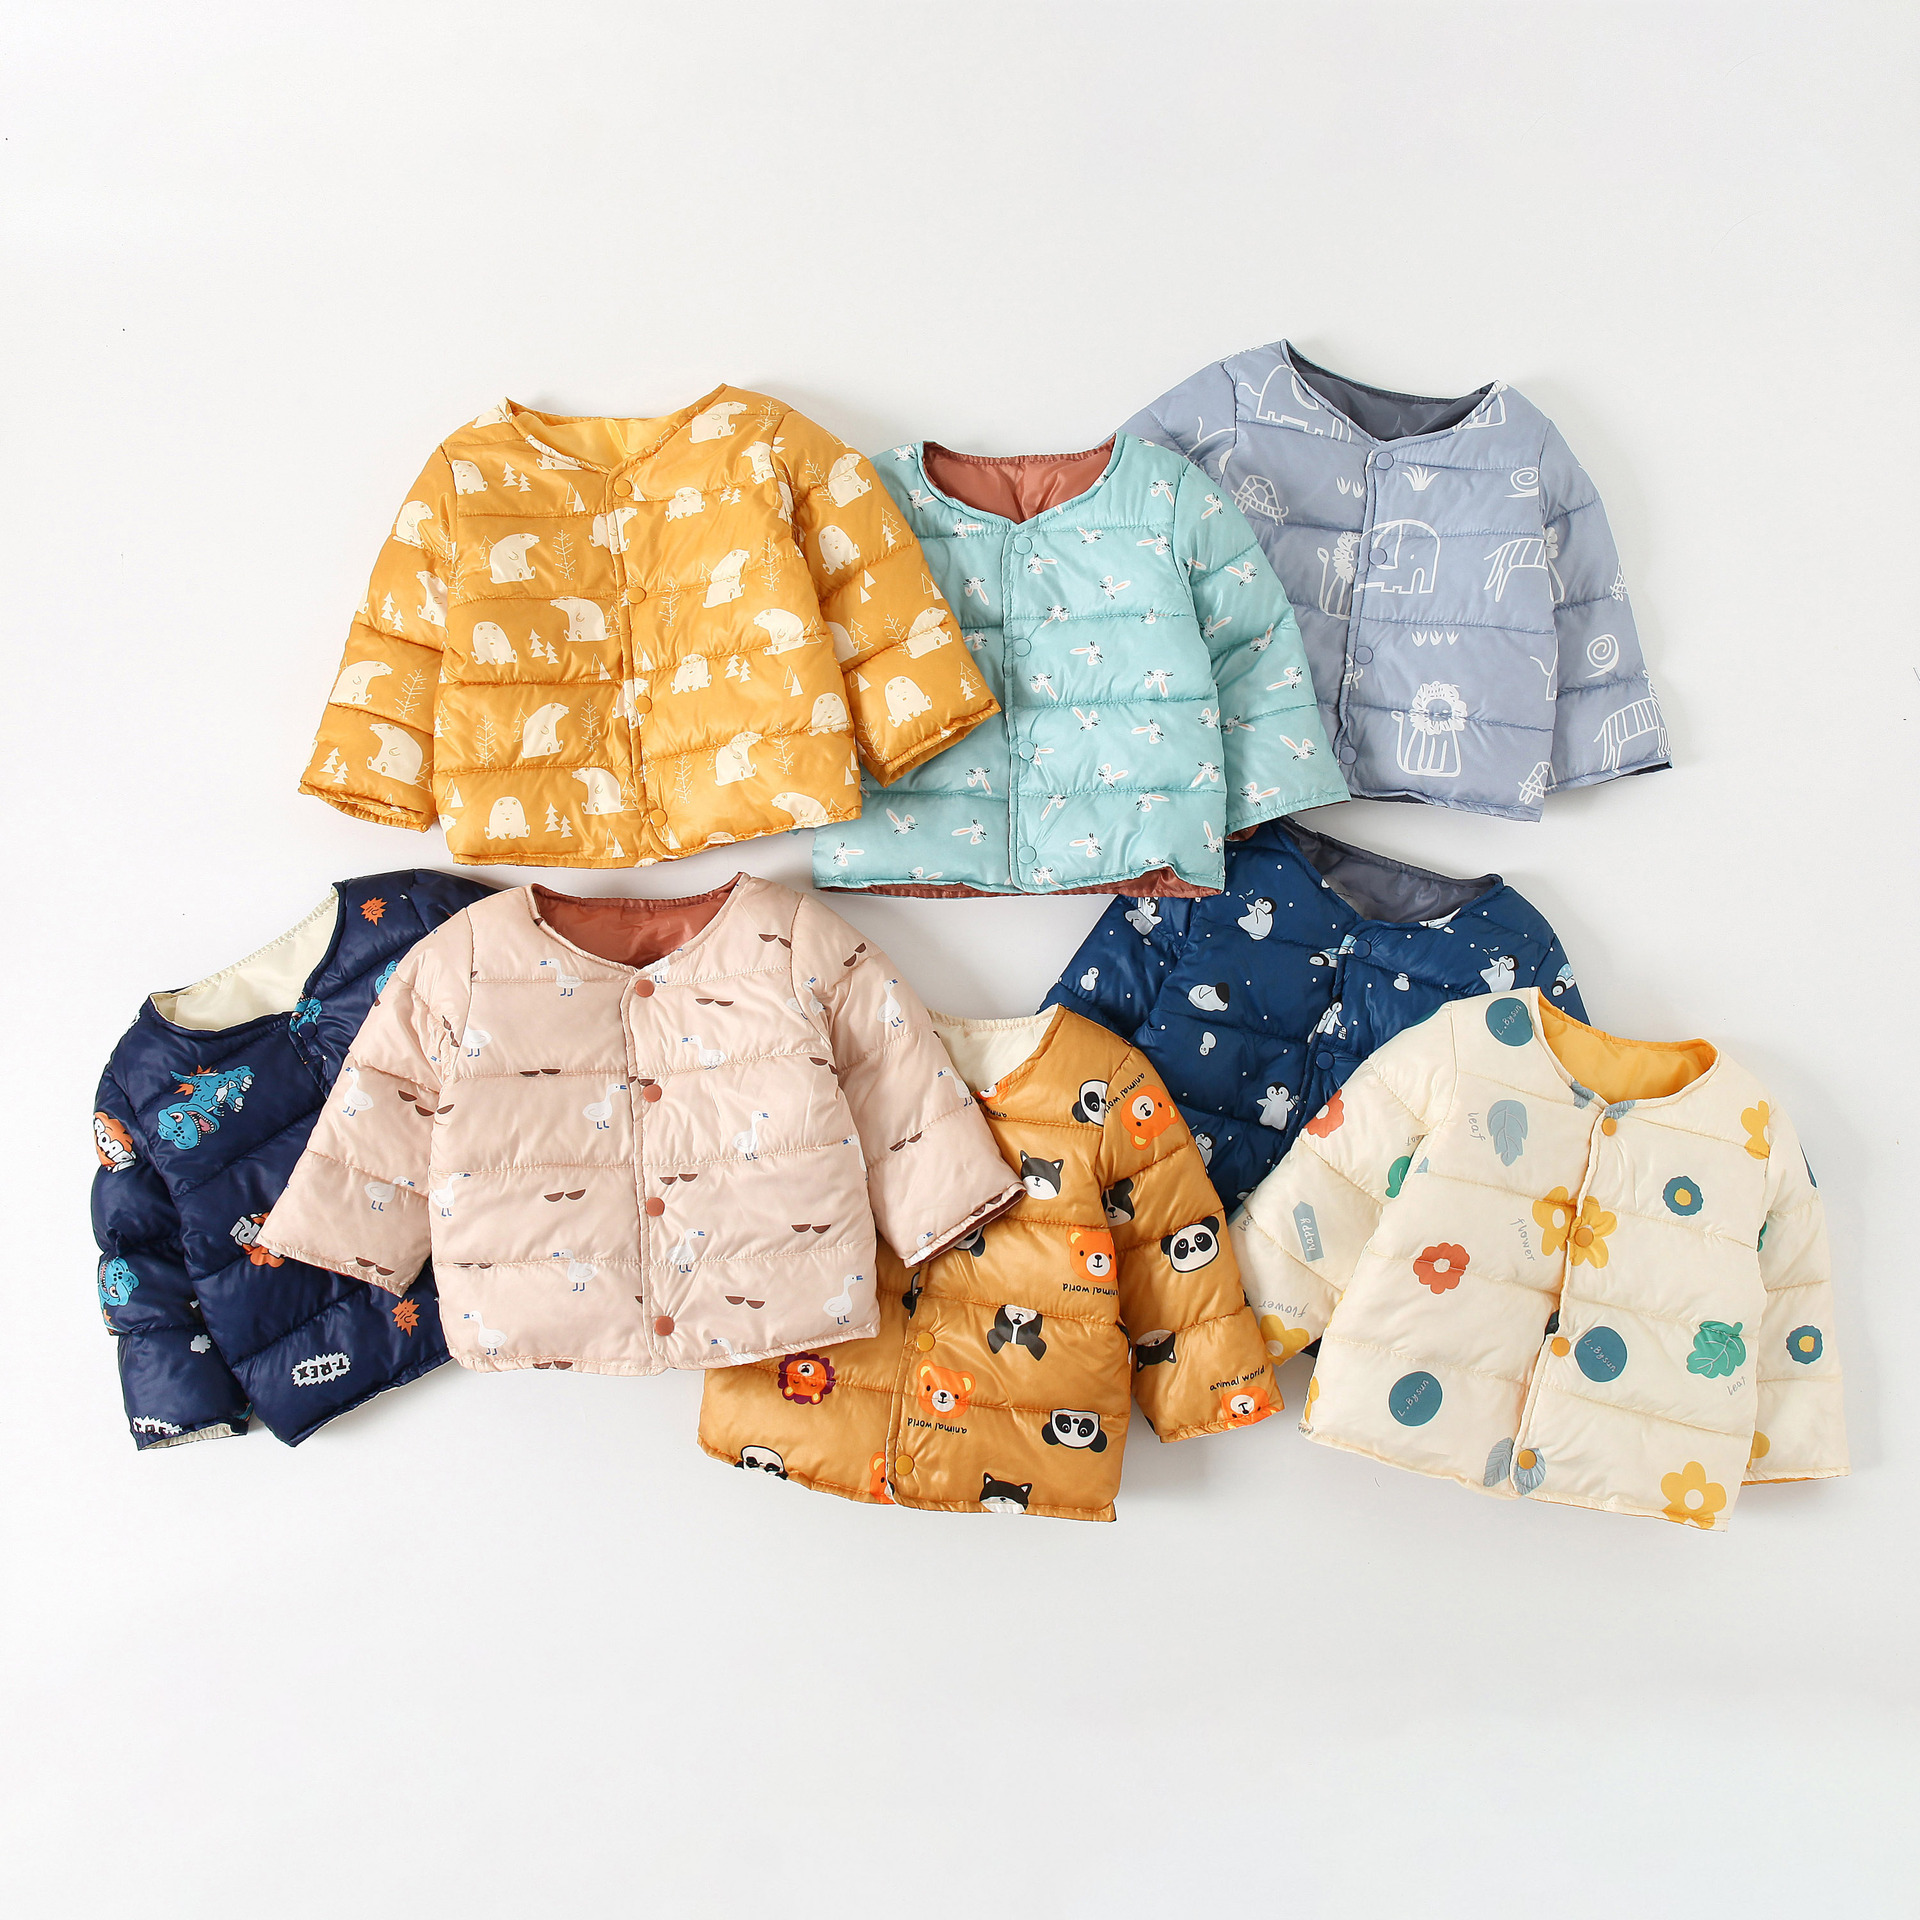 Baby Snowsuit Boys Winter Jacket Cotton-padded Kids Down Coat Outwear Girls Lightweight